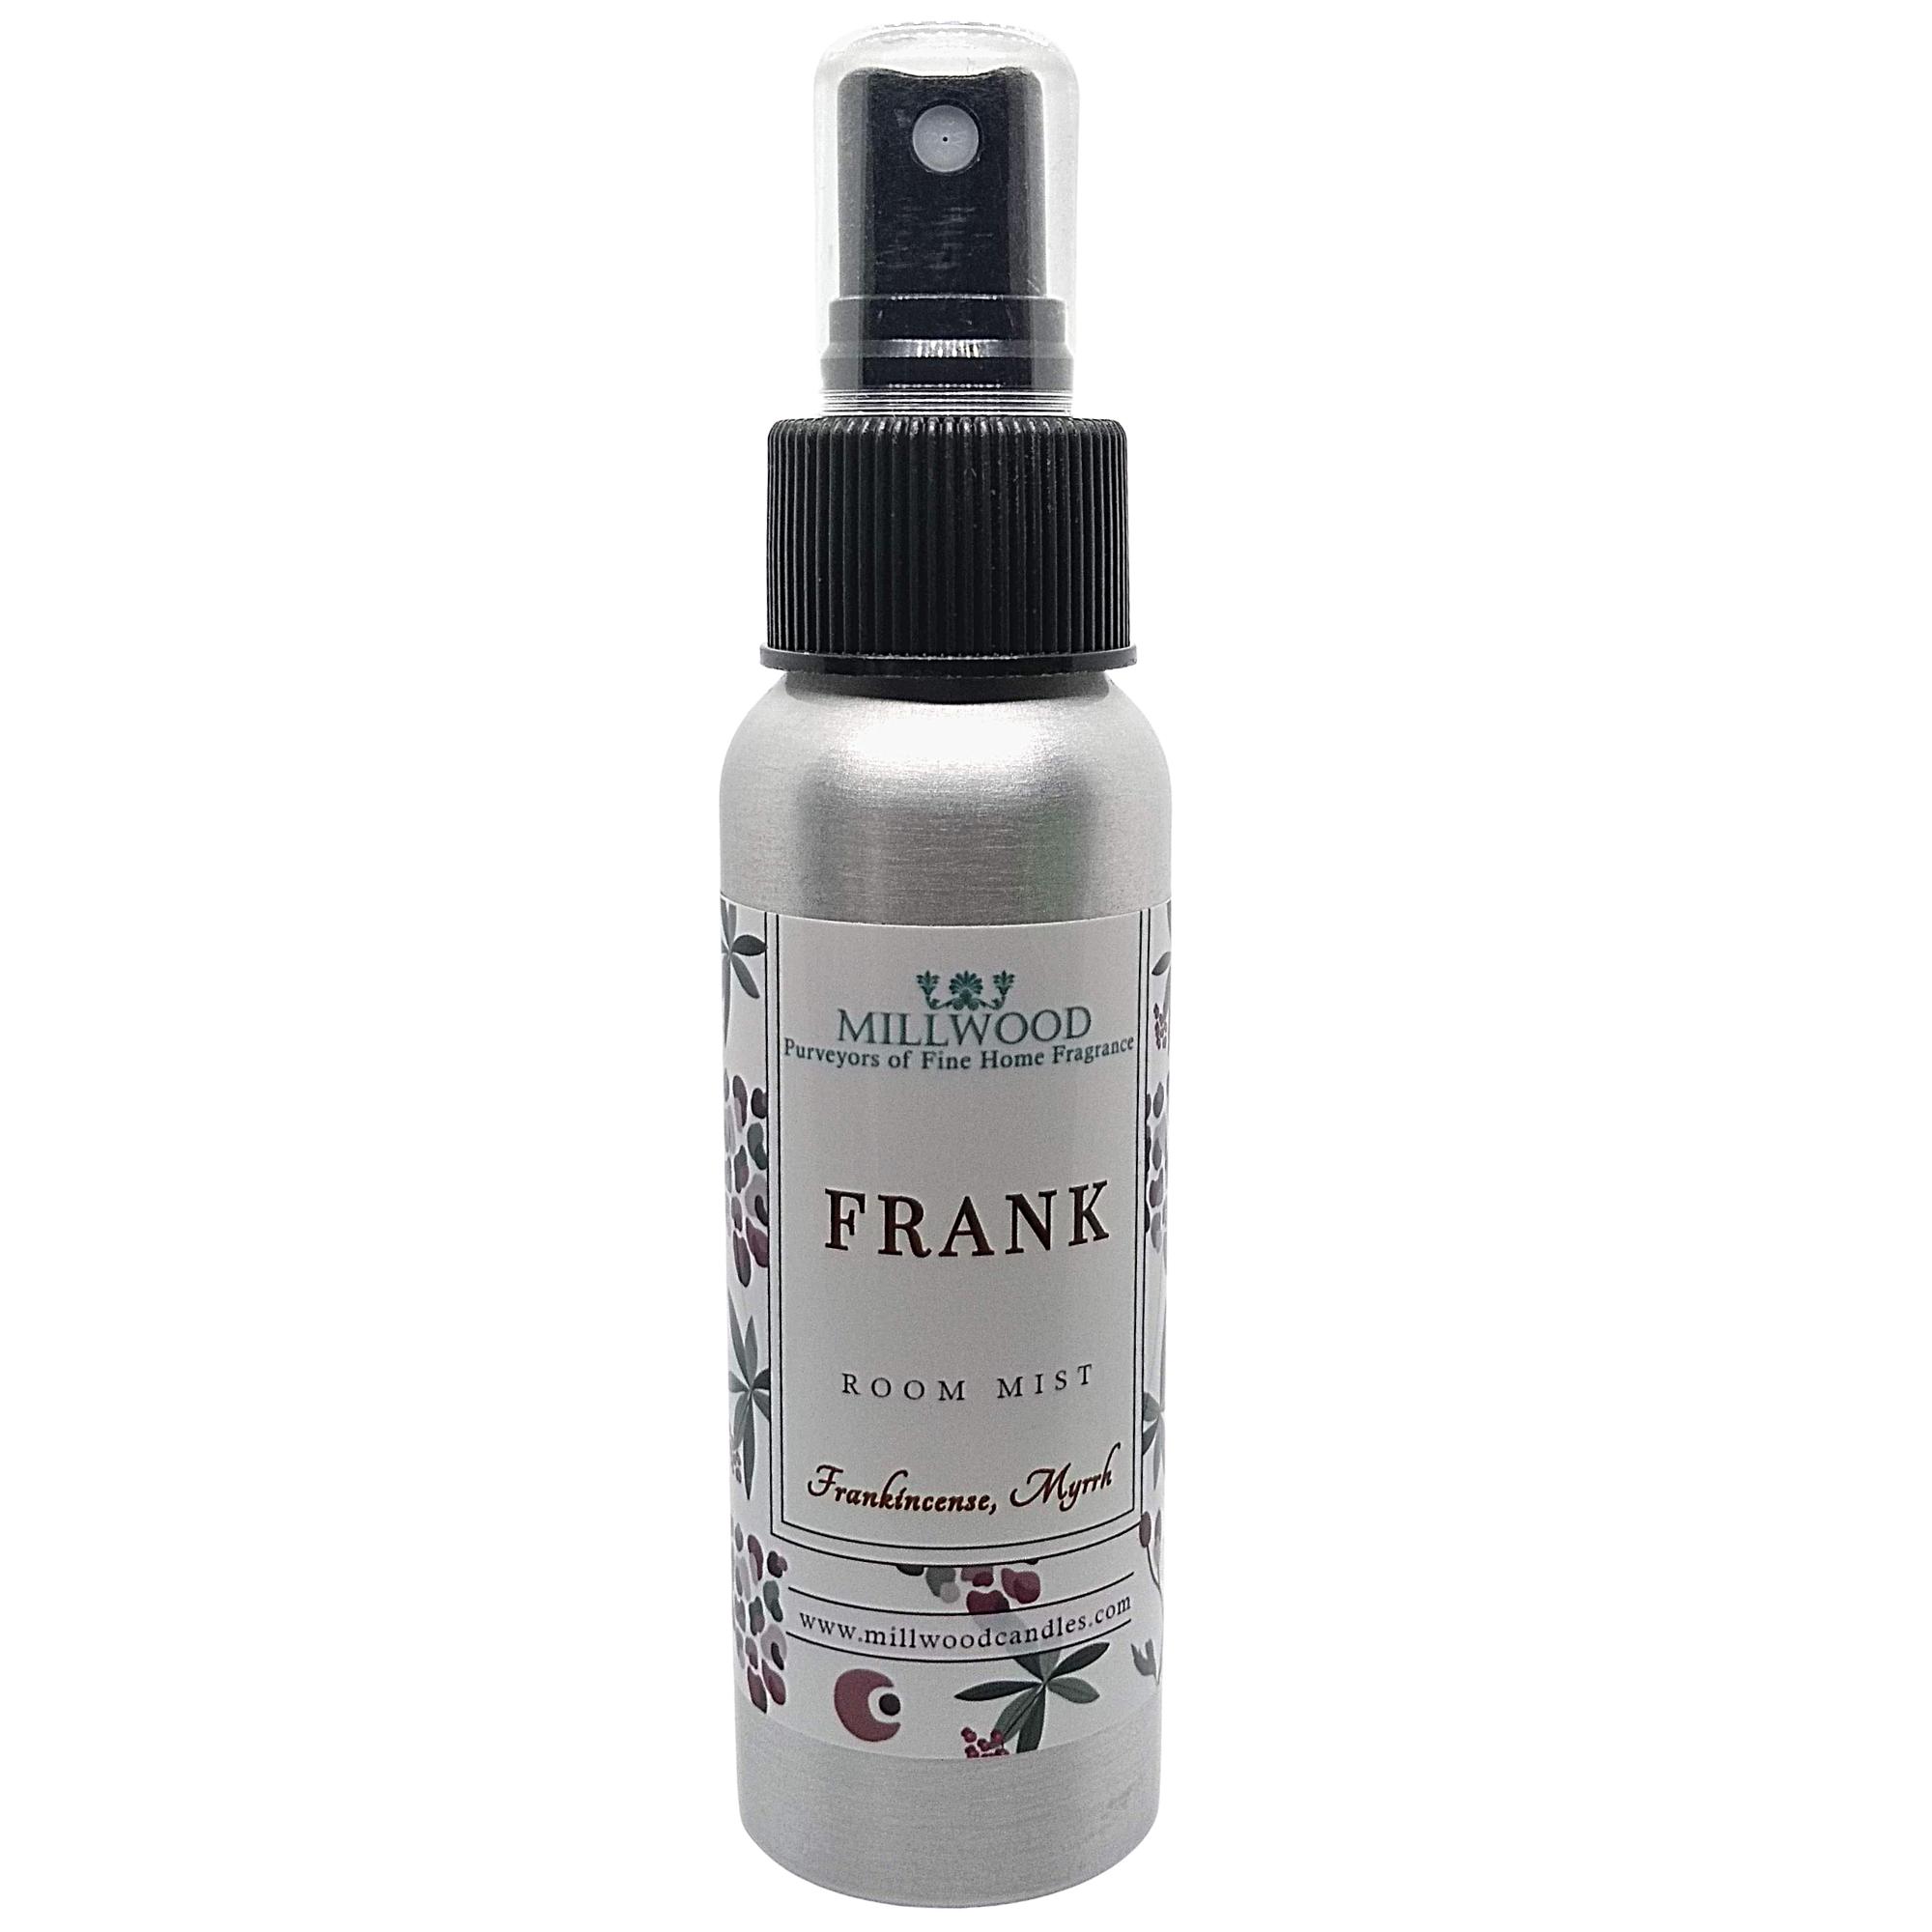 frankincense and myrrh, Frankincense Organic Room Spray, natural air freshener